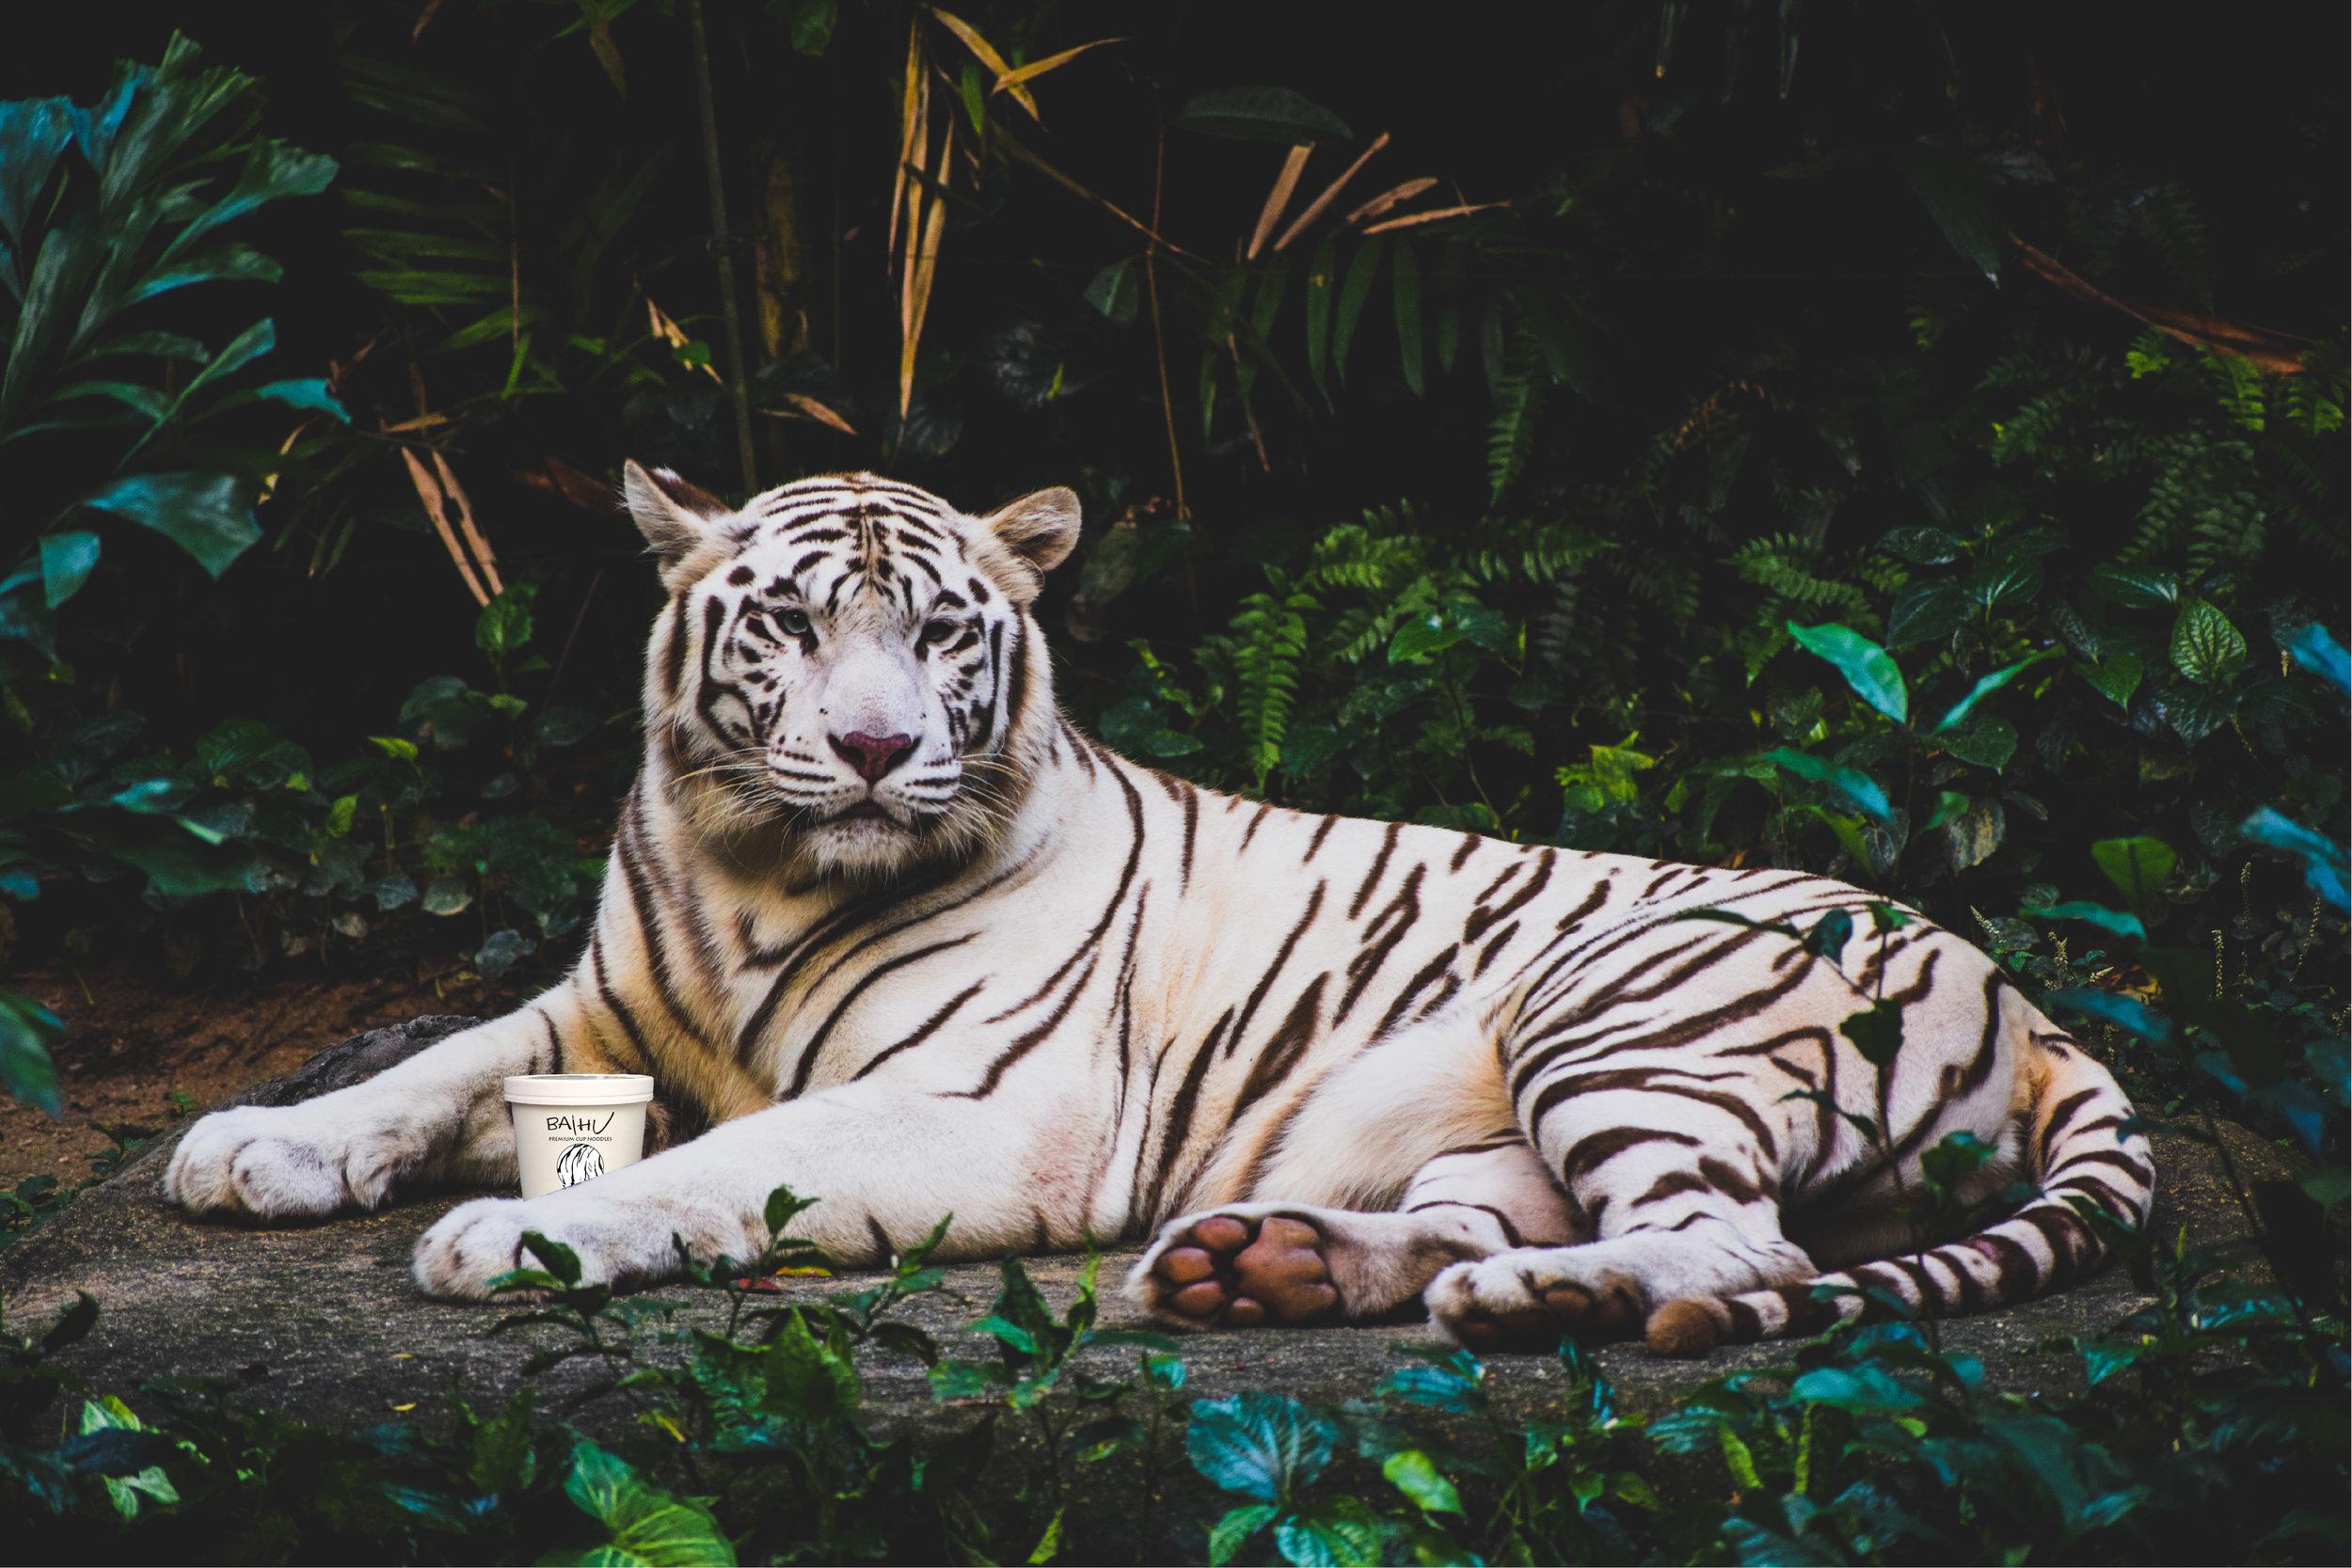 Baihu - White Tiger